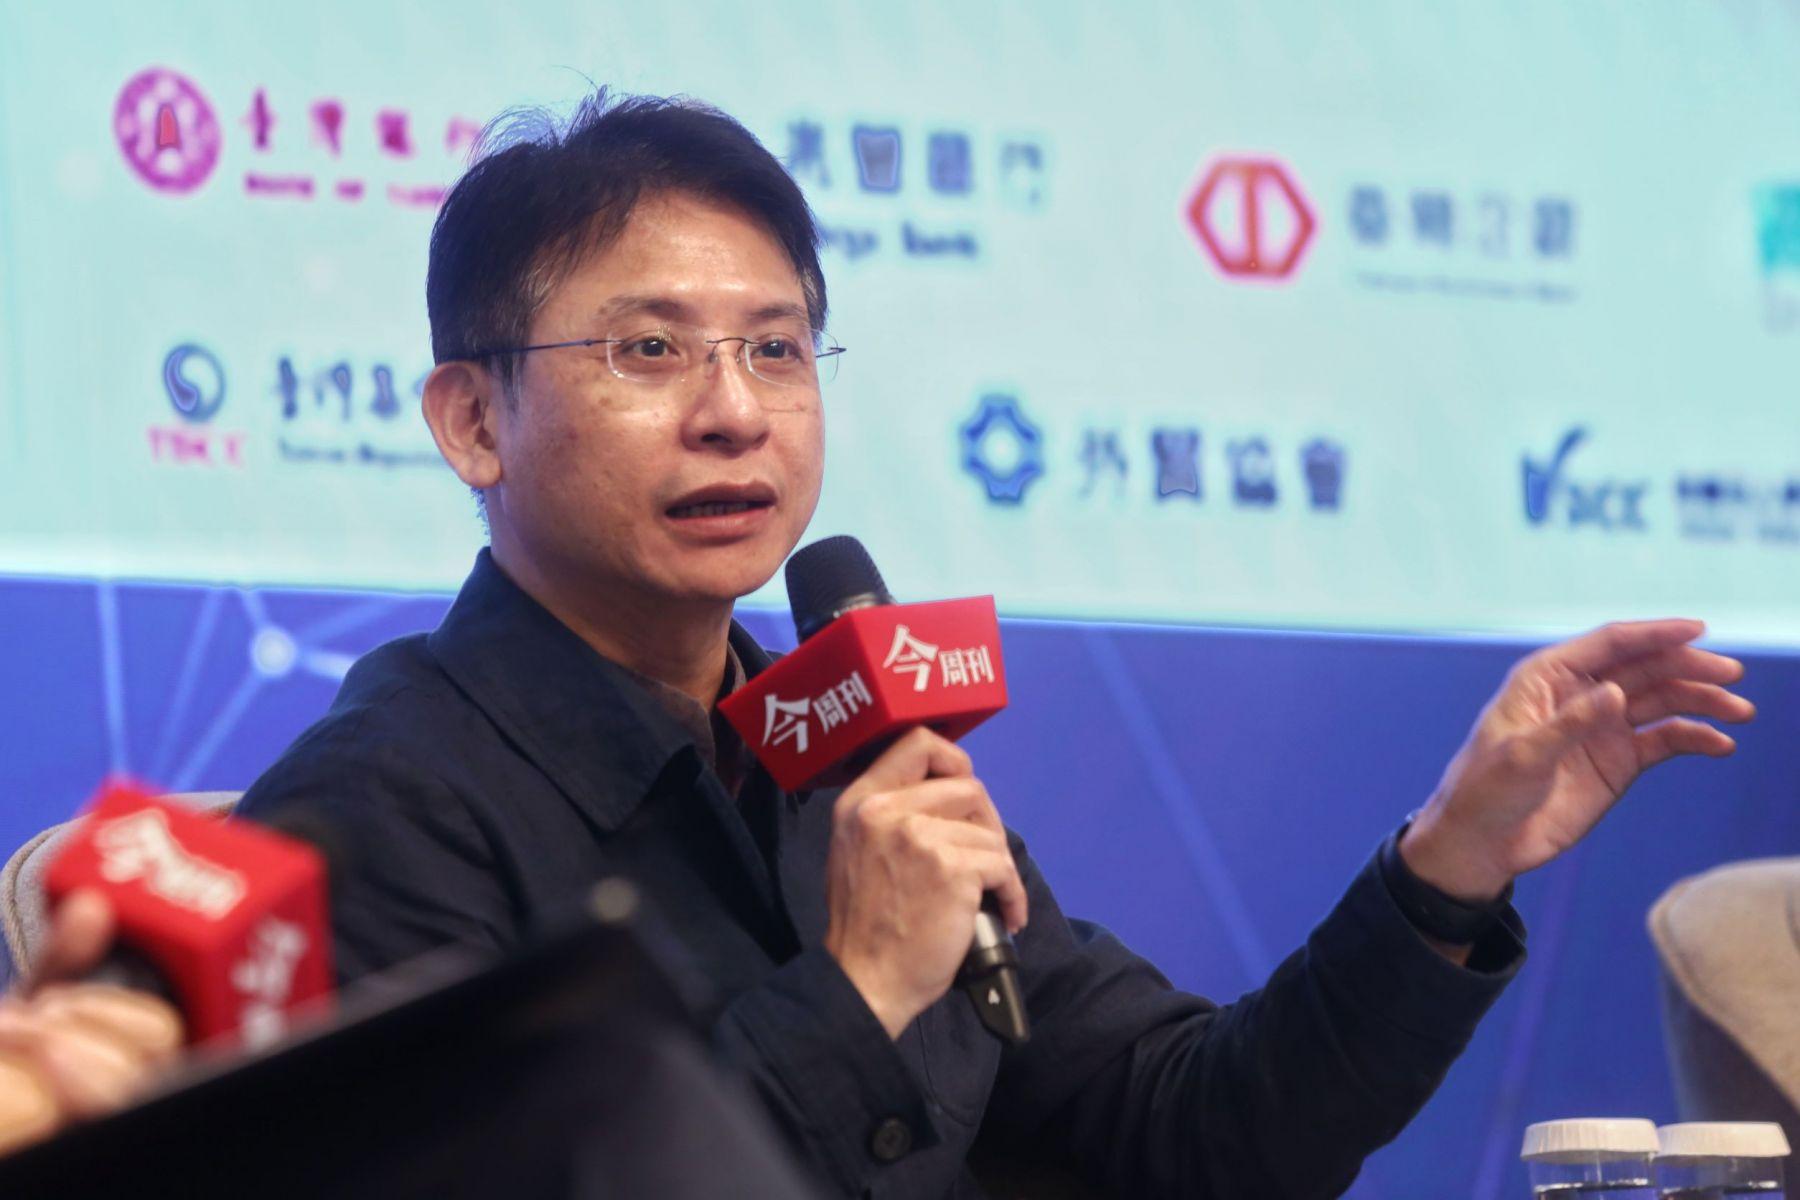 5G讓城市更安全、更有趣 台北市民年底前可望看見「有感改變」